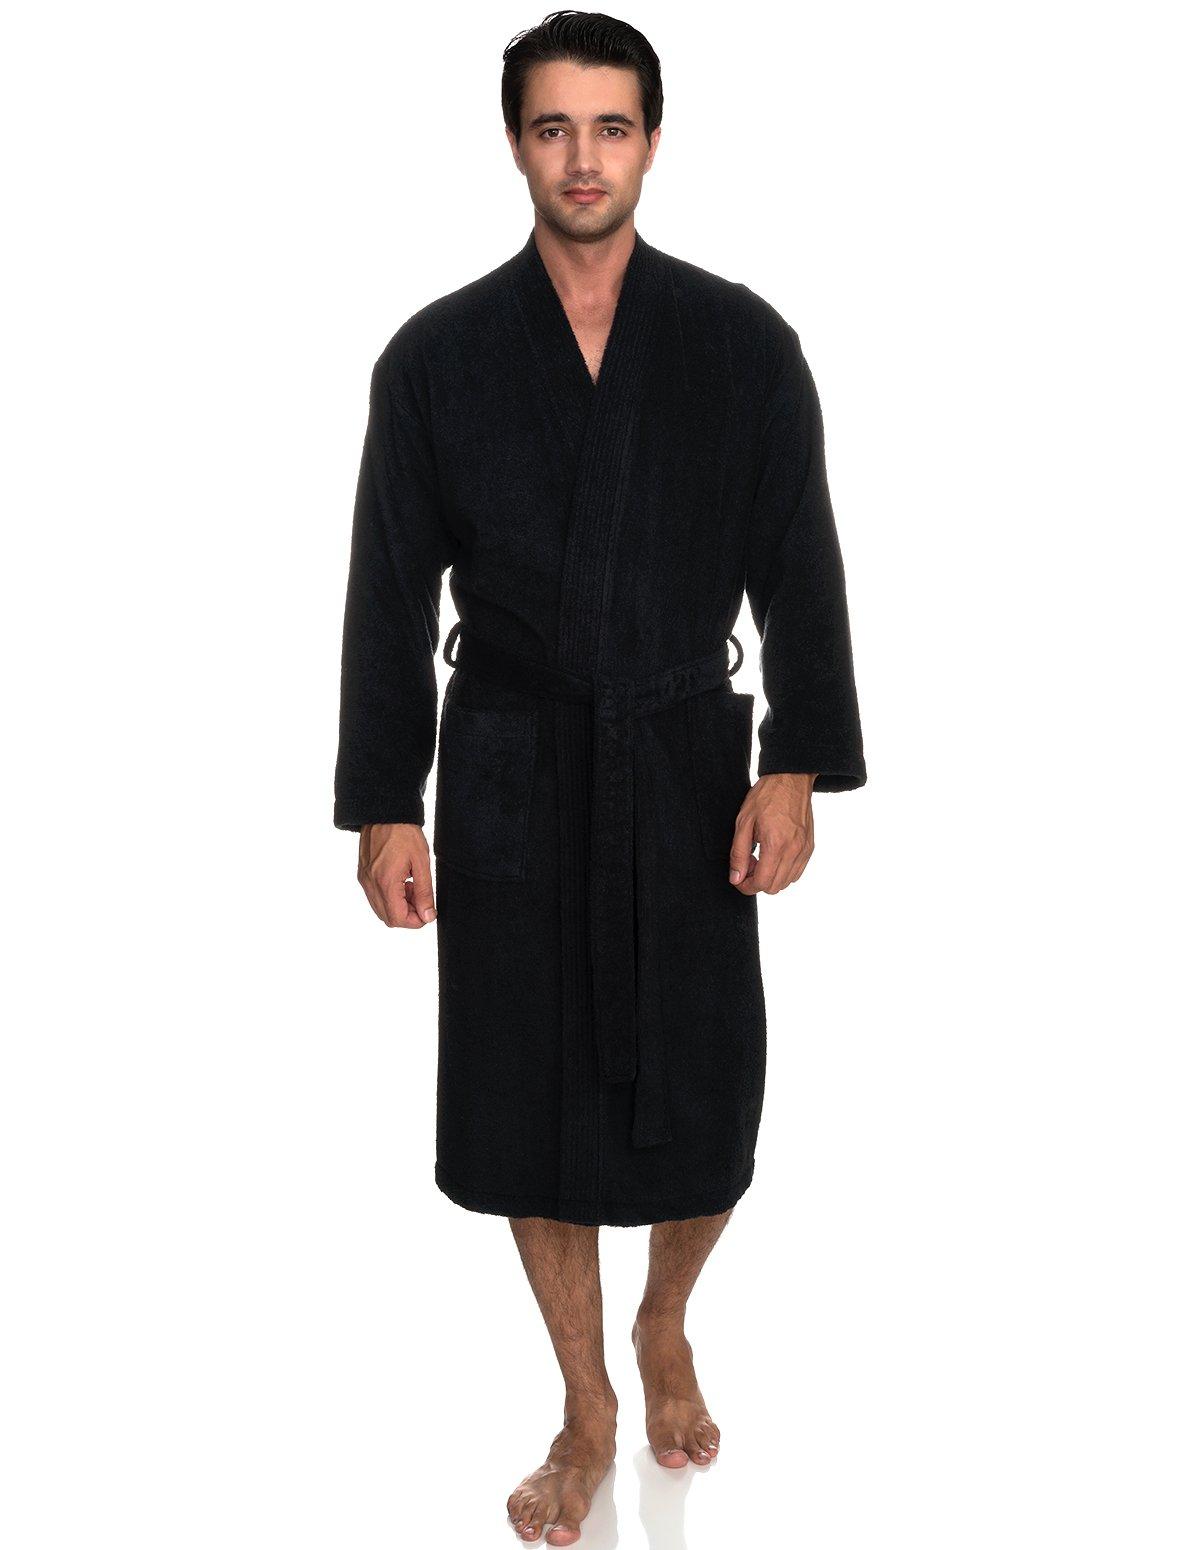 TowelSelections Men's Robe, Turkish Cotton Terry Kimono Bathrobe X-Large/XX-Large Phantom Black